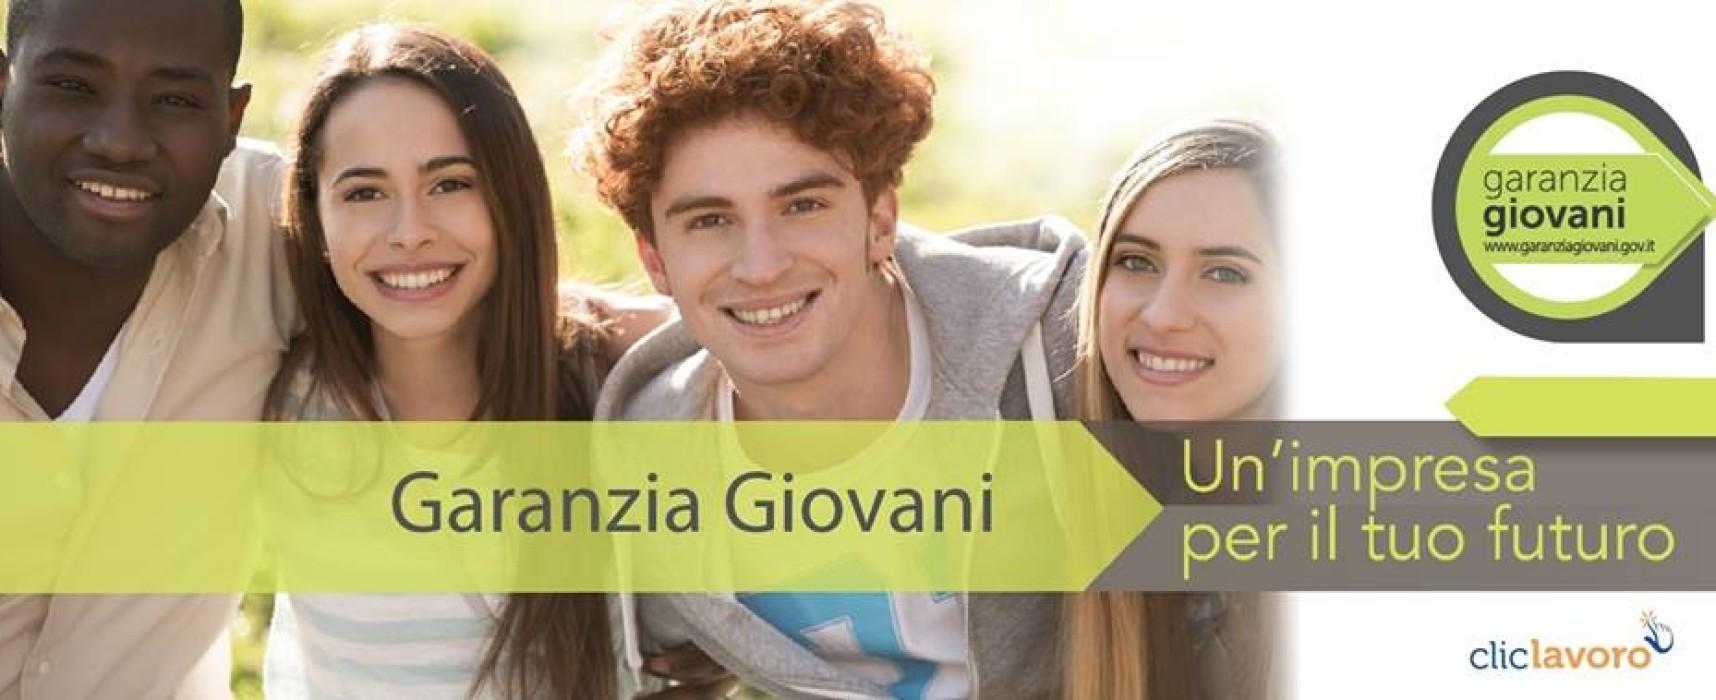 garanzia-giovani1-1716x700_c